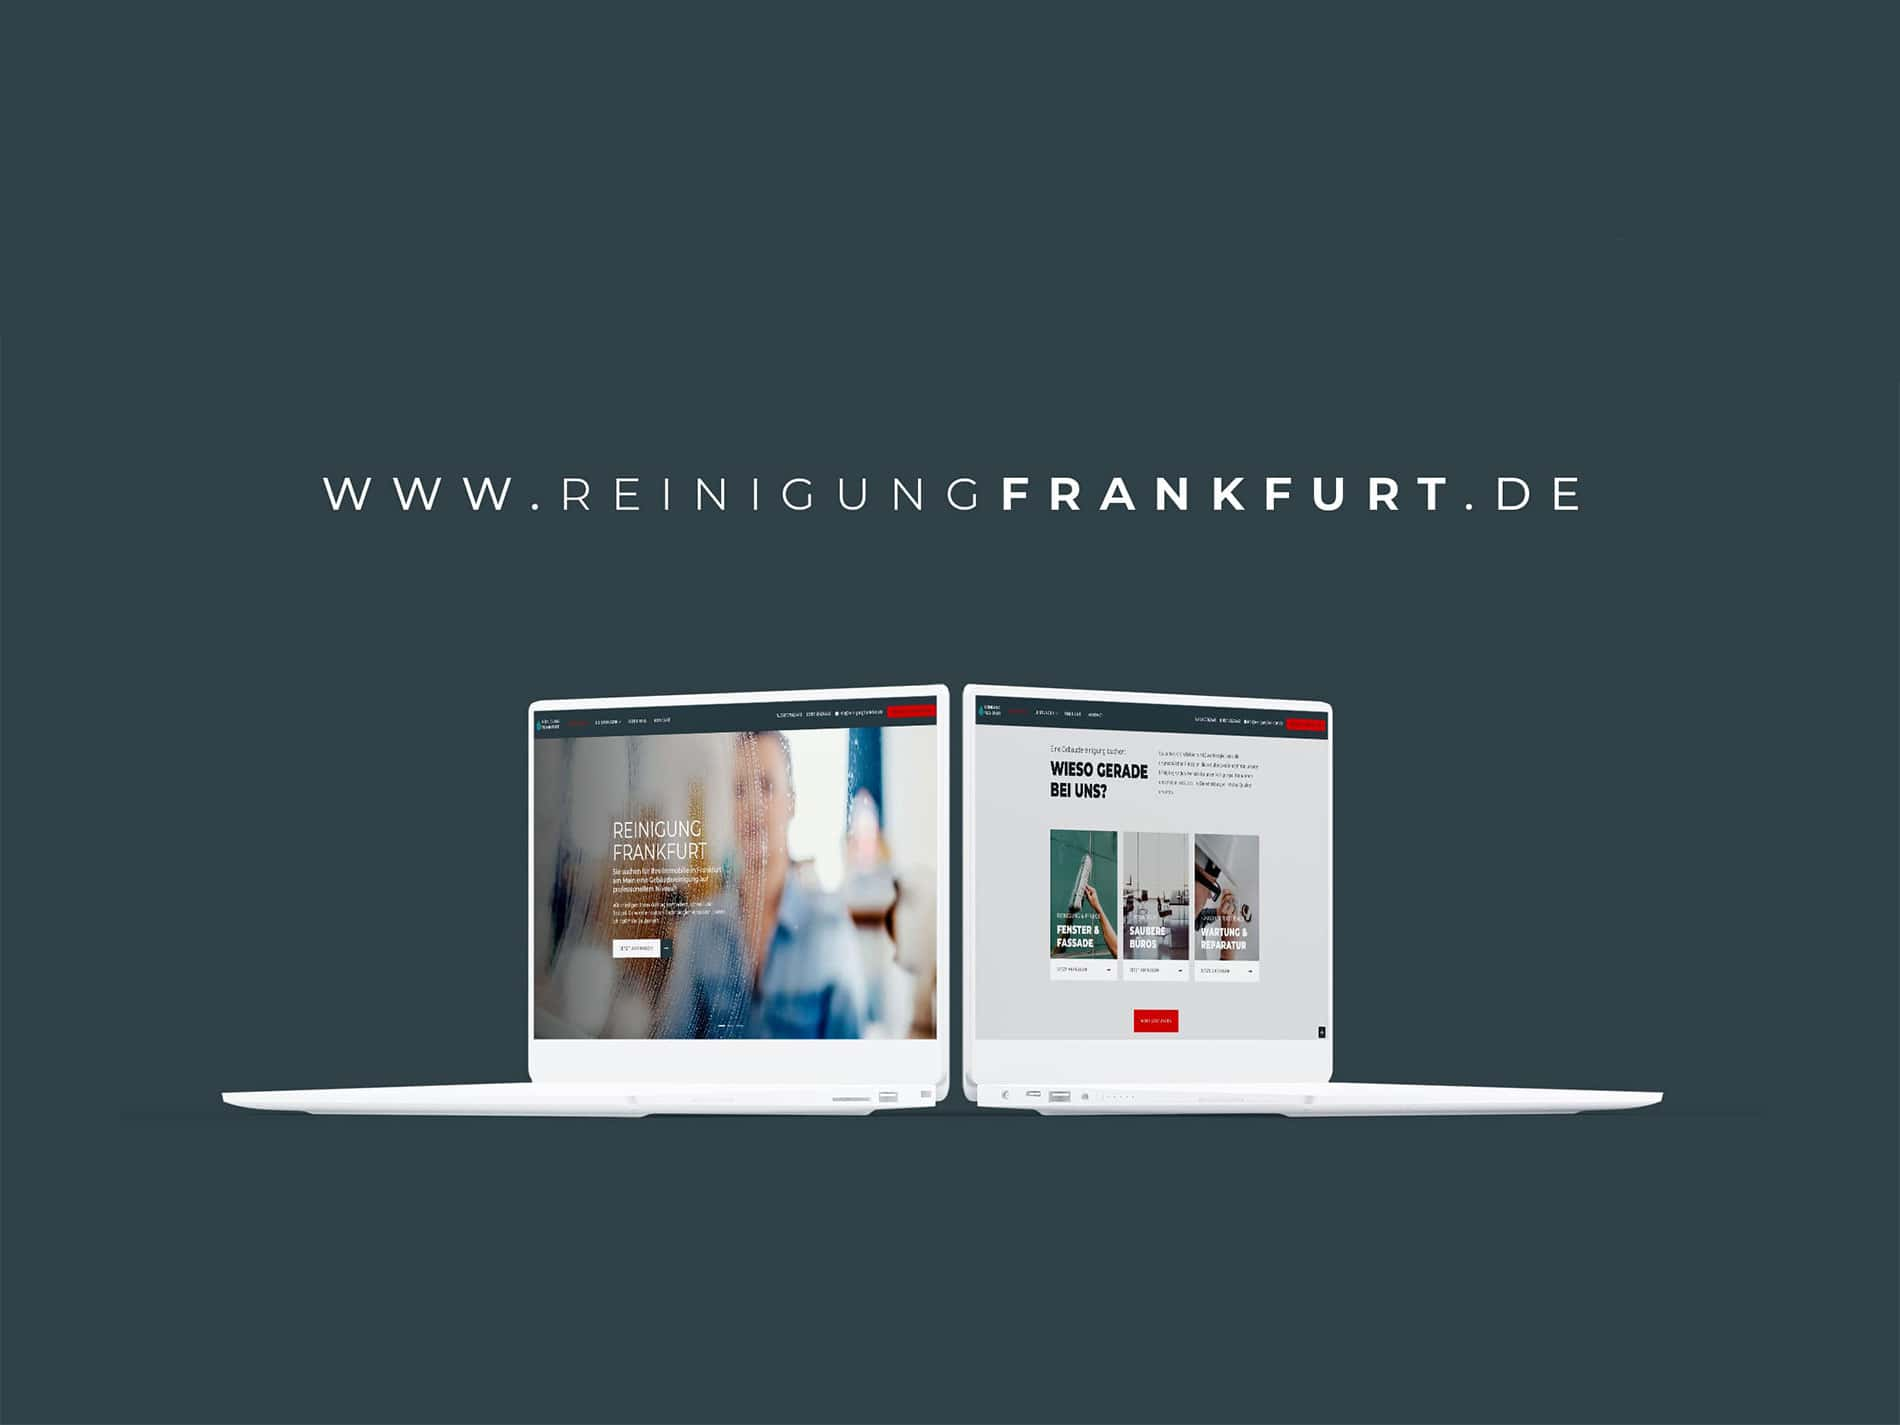 mockup-reinigungfrankfurt-website